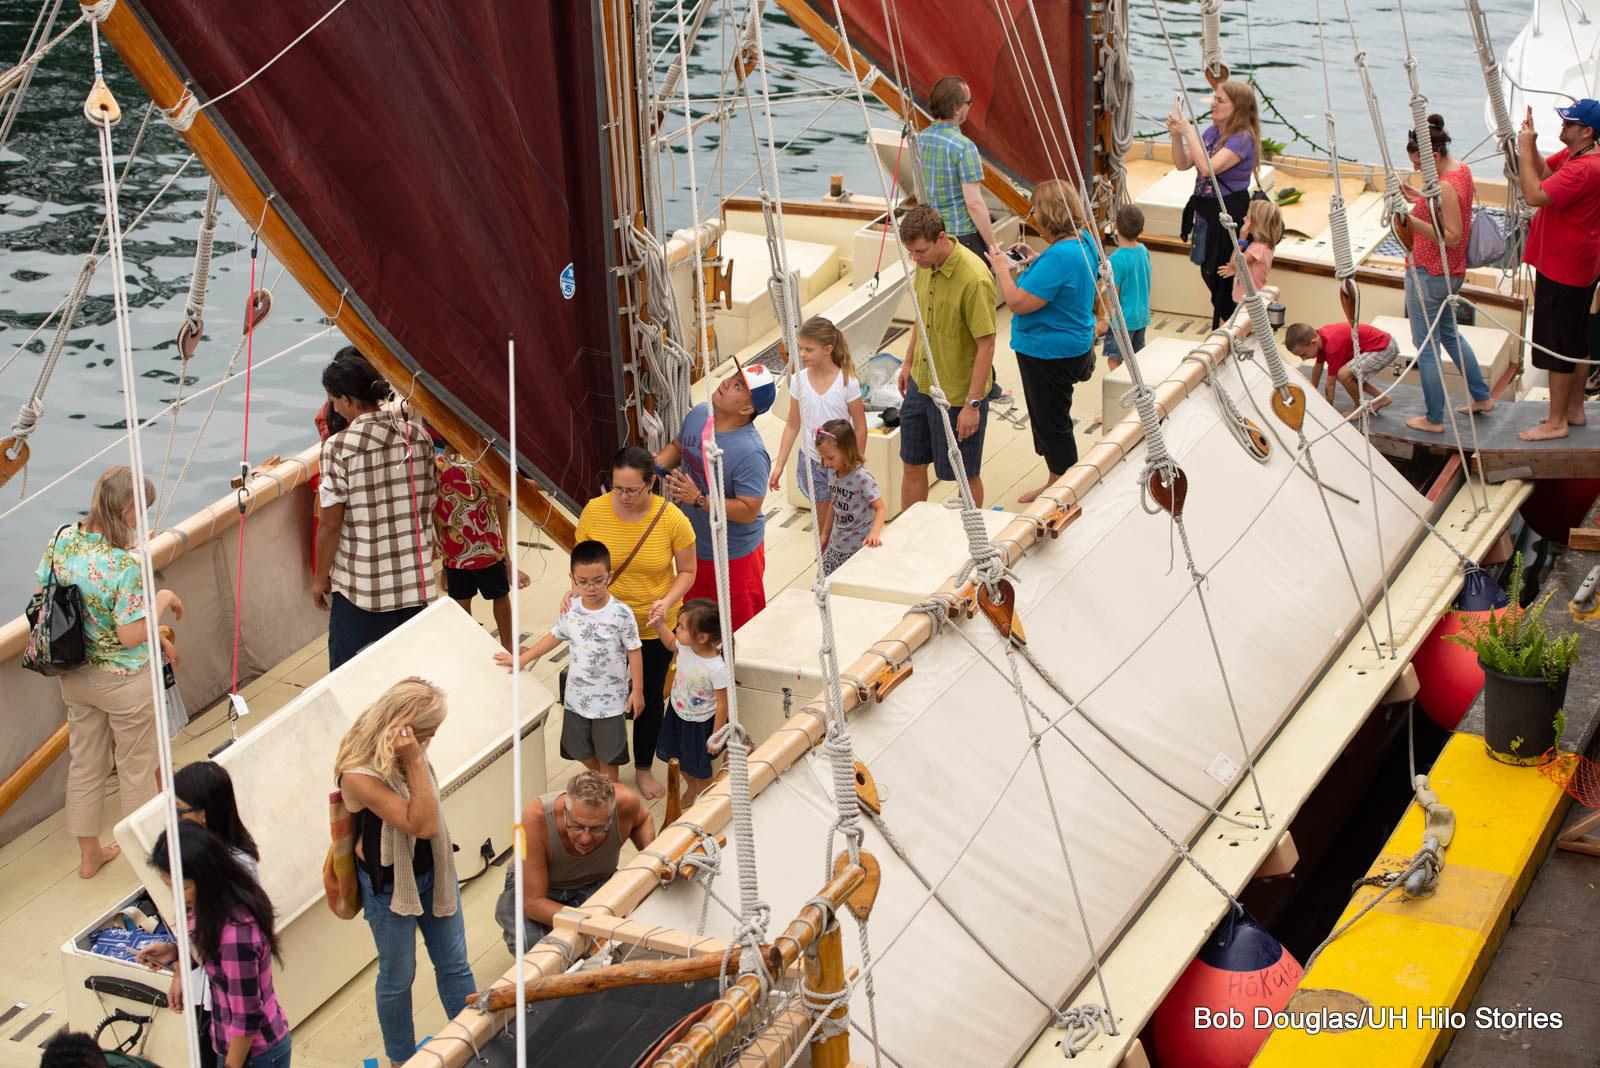 PHOTO ESSAY: Hōkūle'a visits Hilo; UH Hilo co-sponsors educational expo